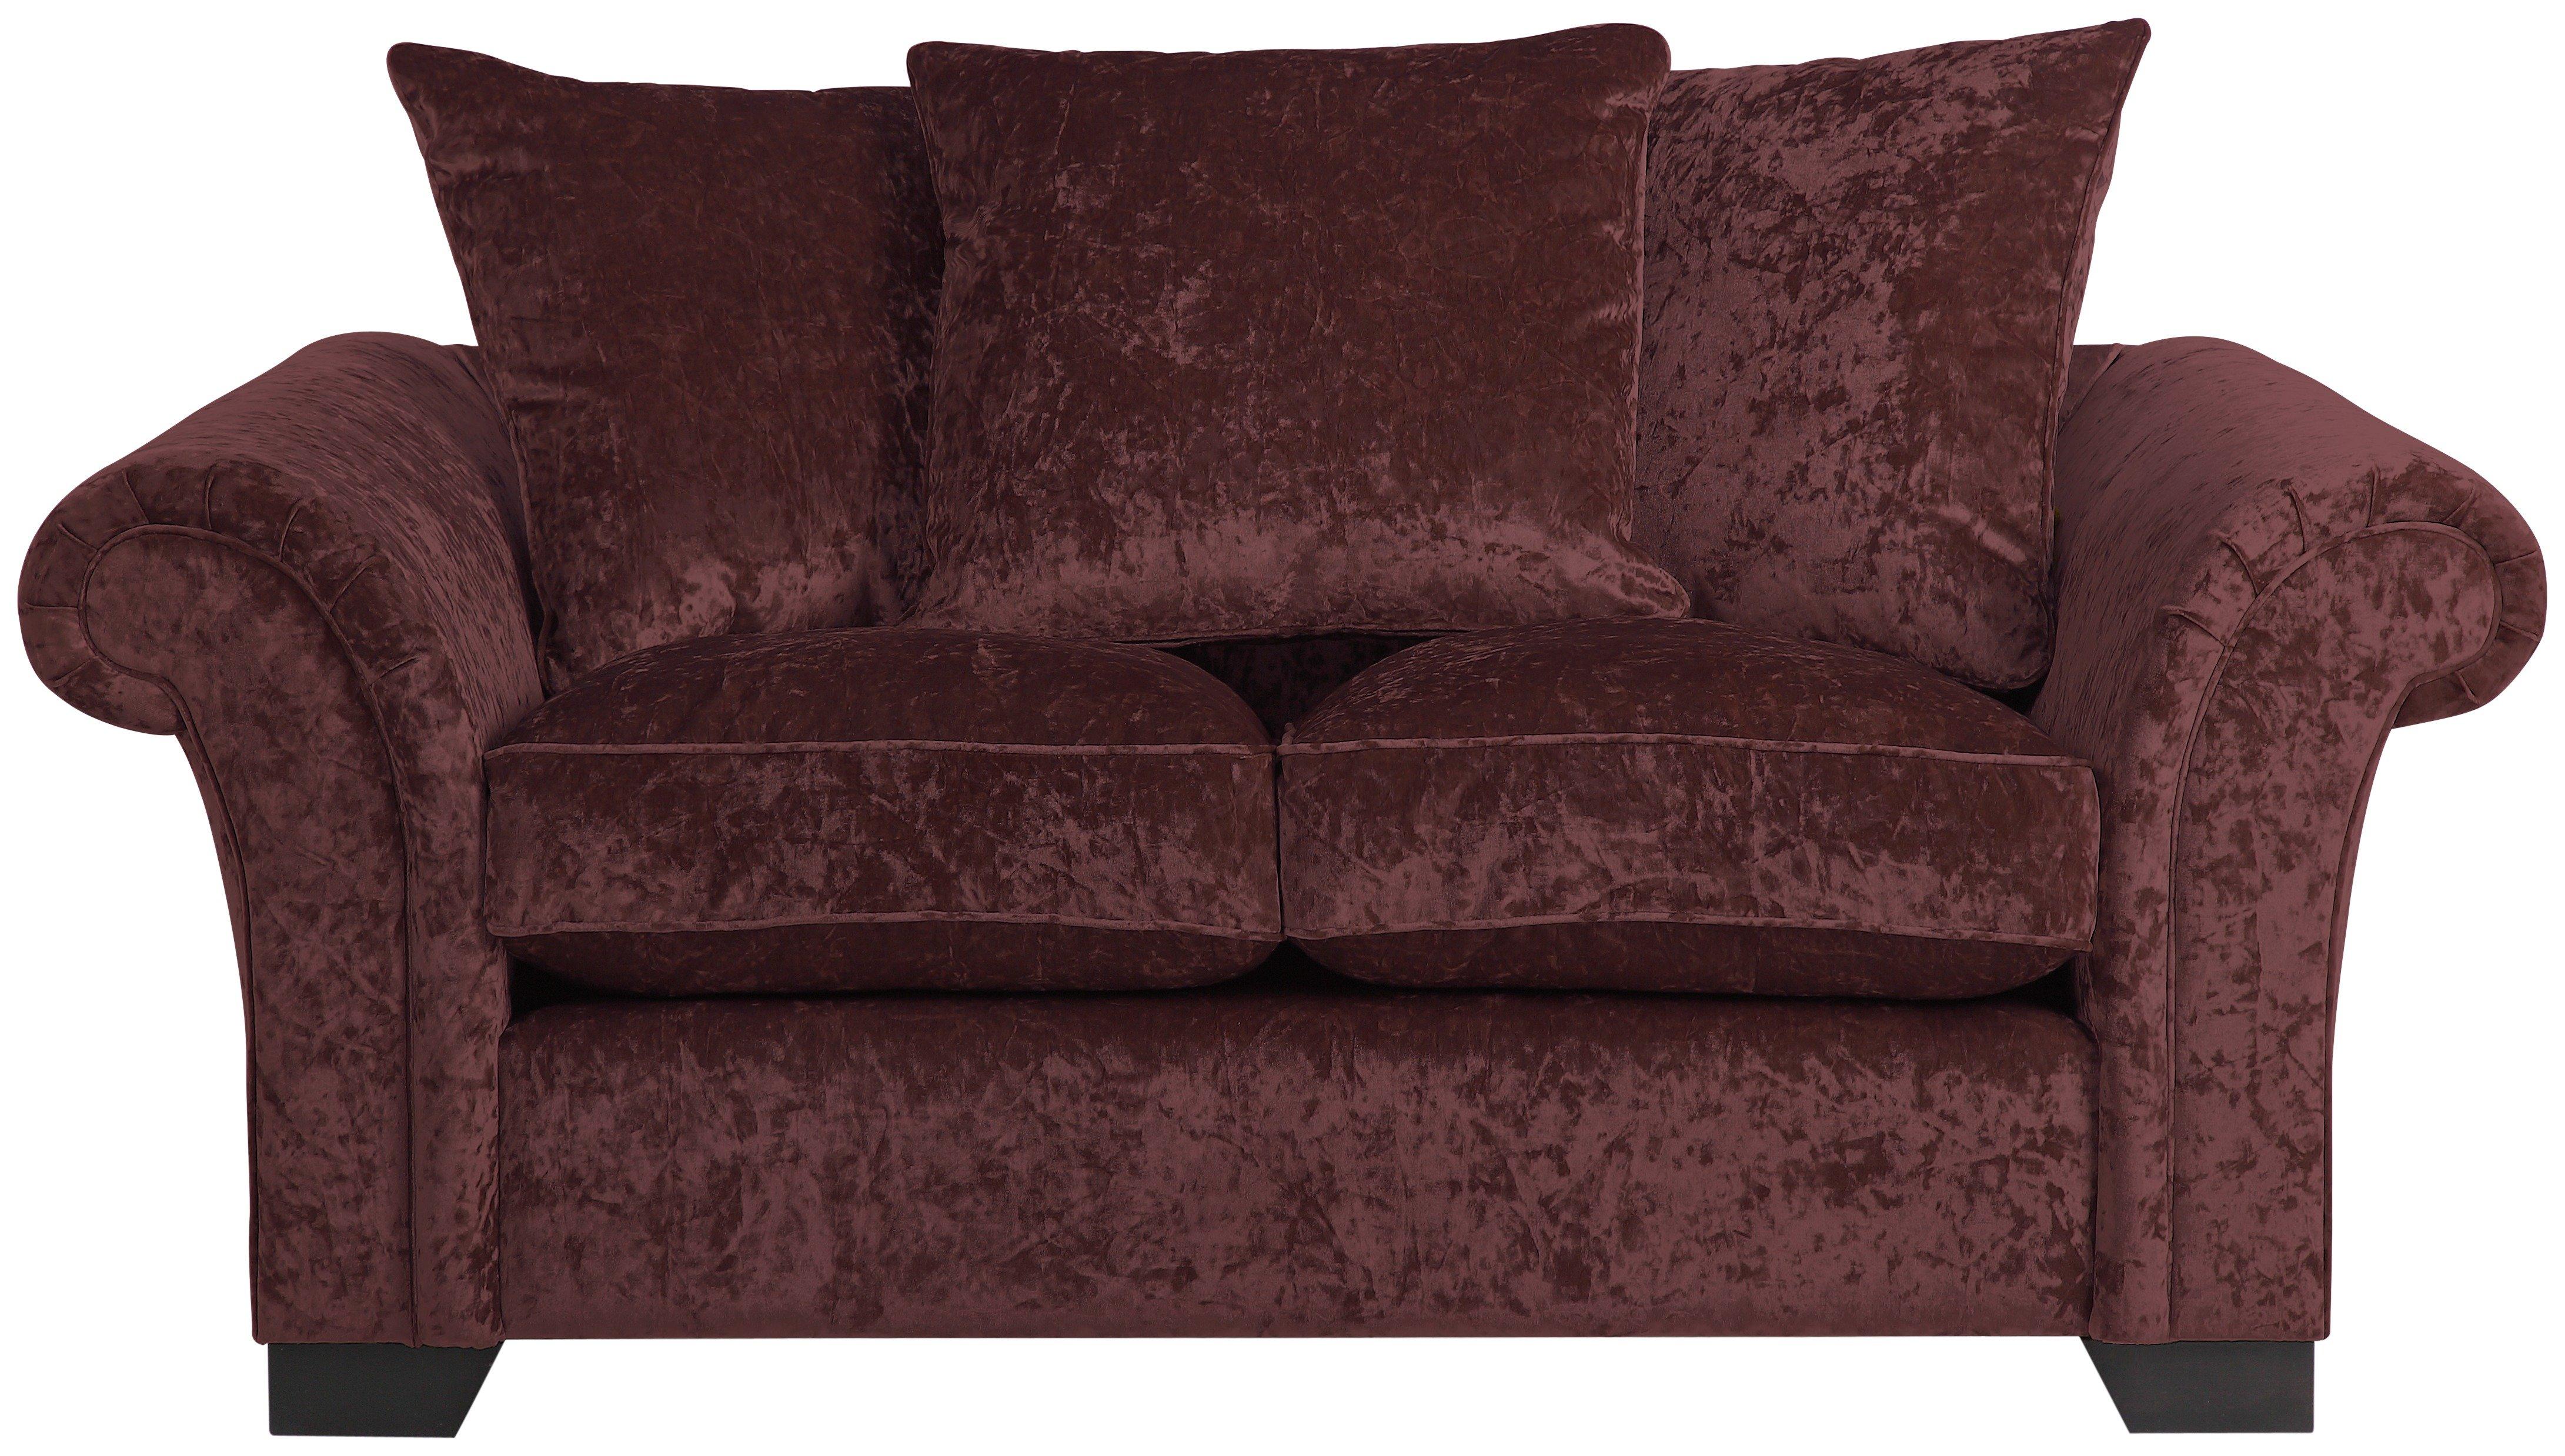 argos ava fabric sofa review cote style furniture home glitz 2 seater mulberry